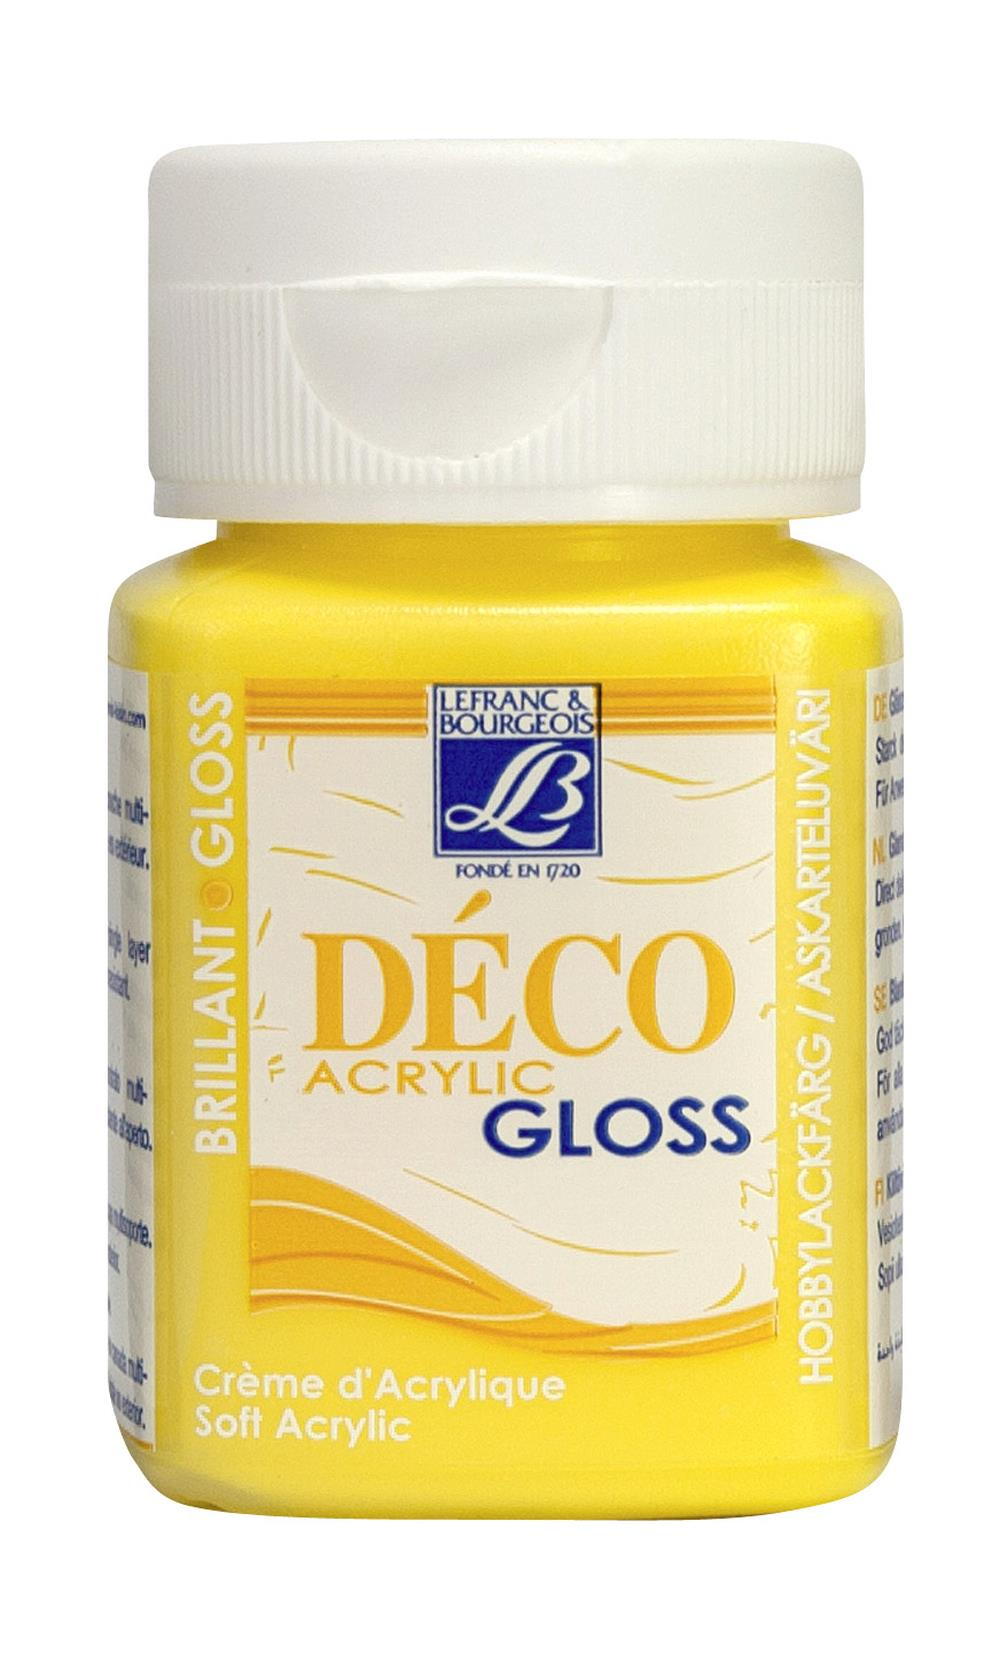 Hobbyfärg L&B Deco Gloss Akryl 50ml  Sun 186 (4F) Utgår